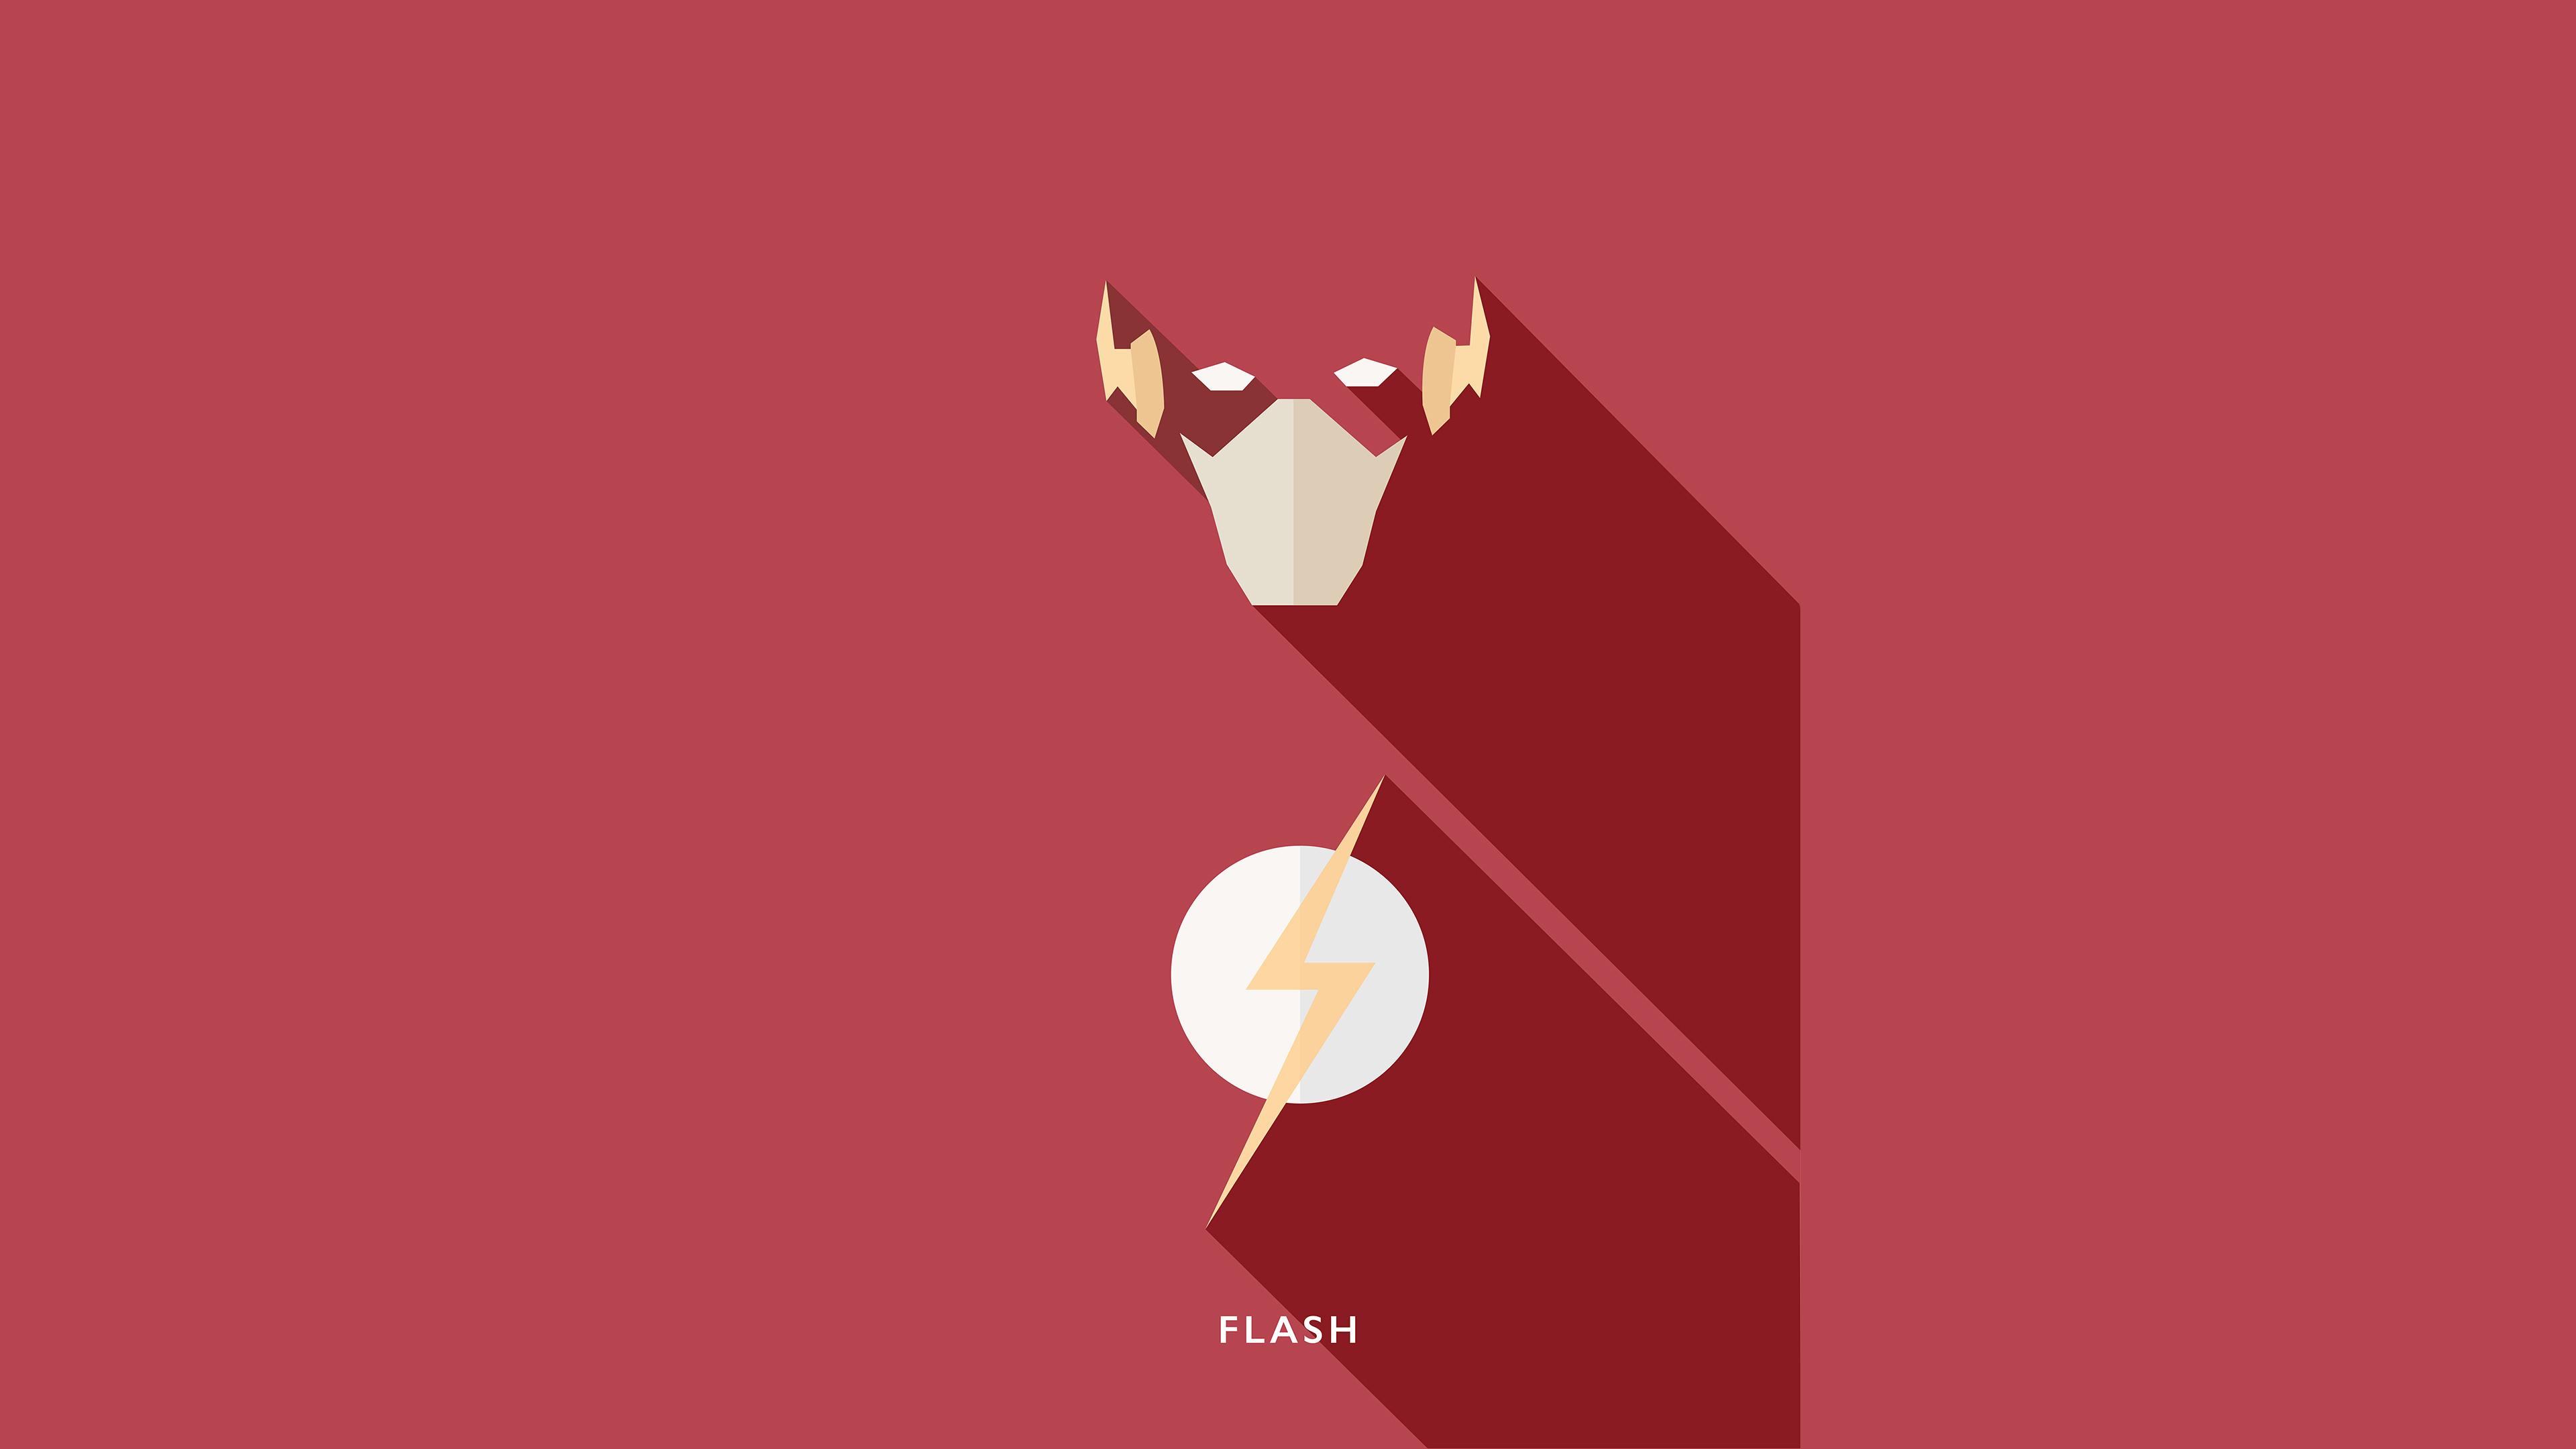 flash minimalisms 4k 1553071257 - Flash Minimalisms 4k - superheroes wallpapers, minimalist wallpapers, minimalism wallpapers, hd-wallpapers, flash wallpapers, digital art wallpapers, behance wallpapers, artwork wallpapers, artist wallpapers, 4k-wallpapers